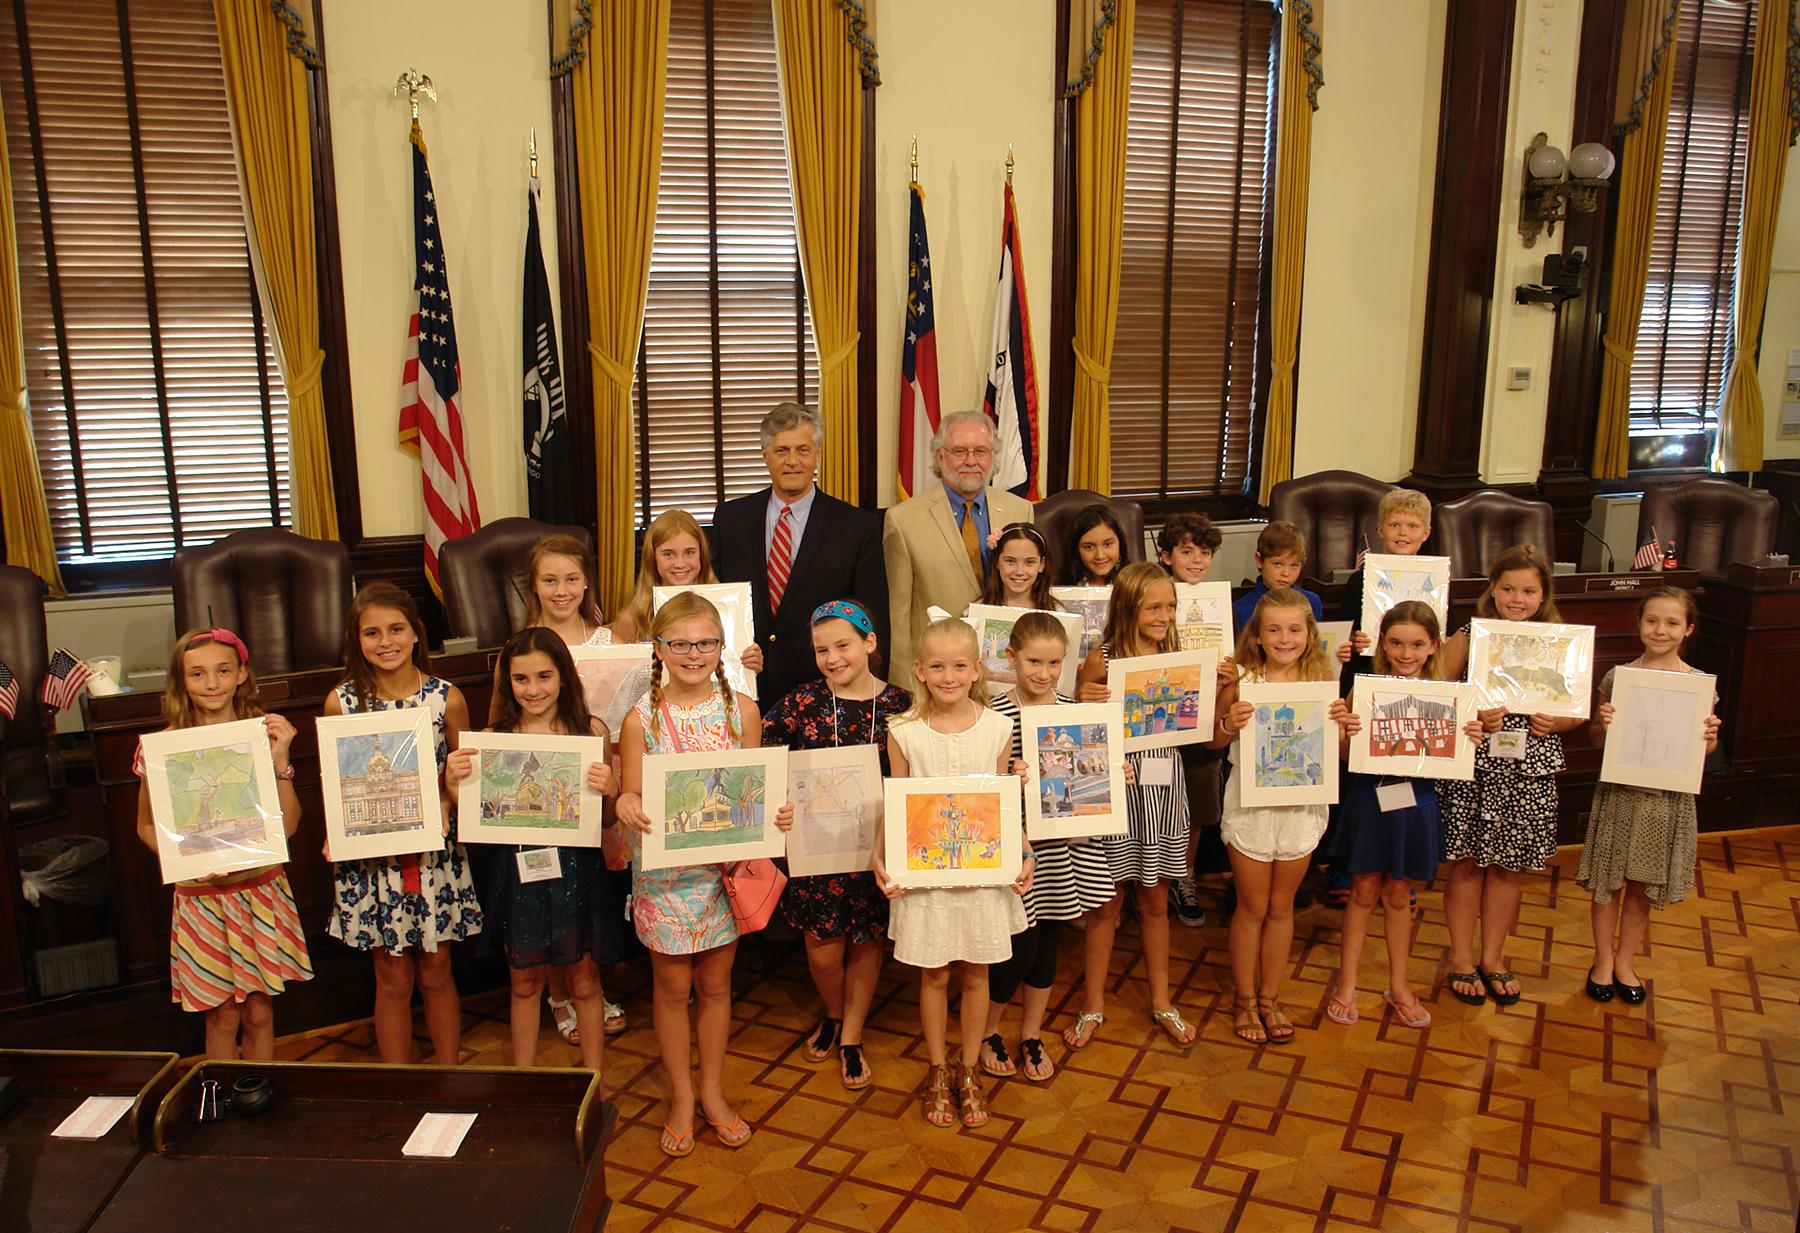 City Hall Student Art Exhibits | Savannah, GA - Official Website